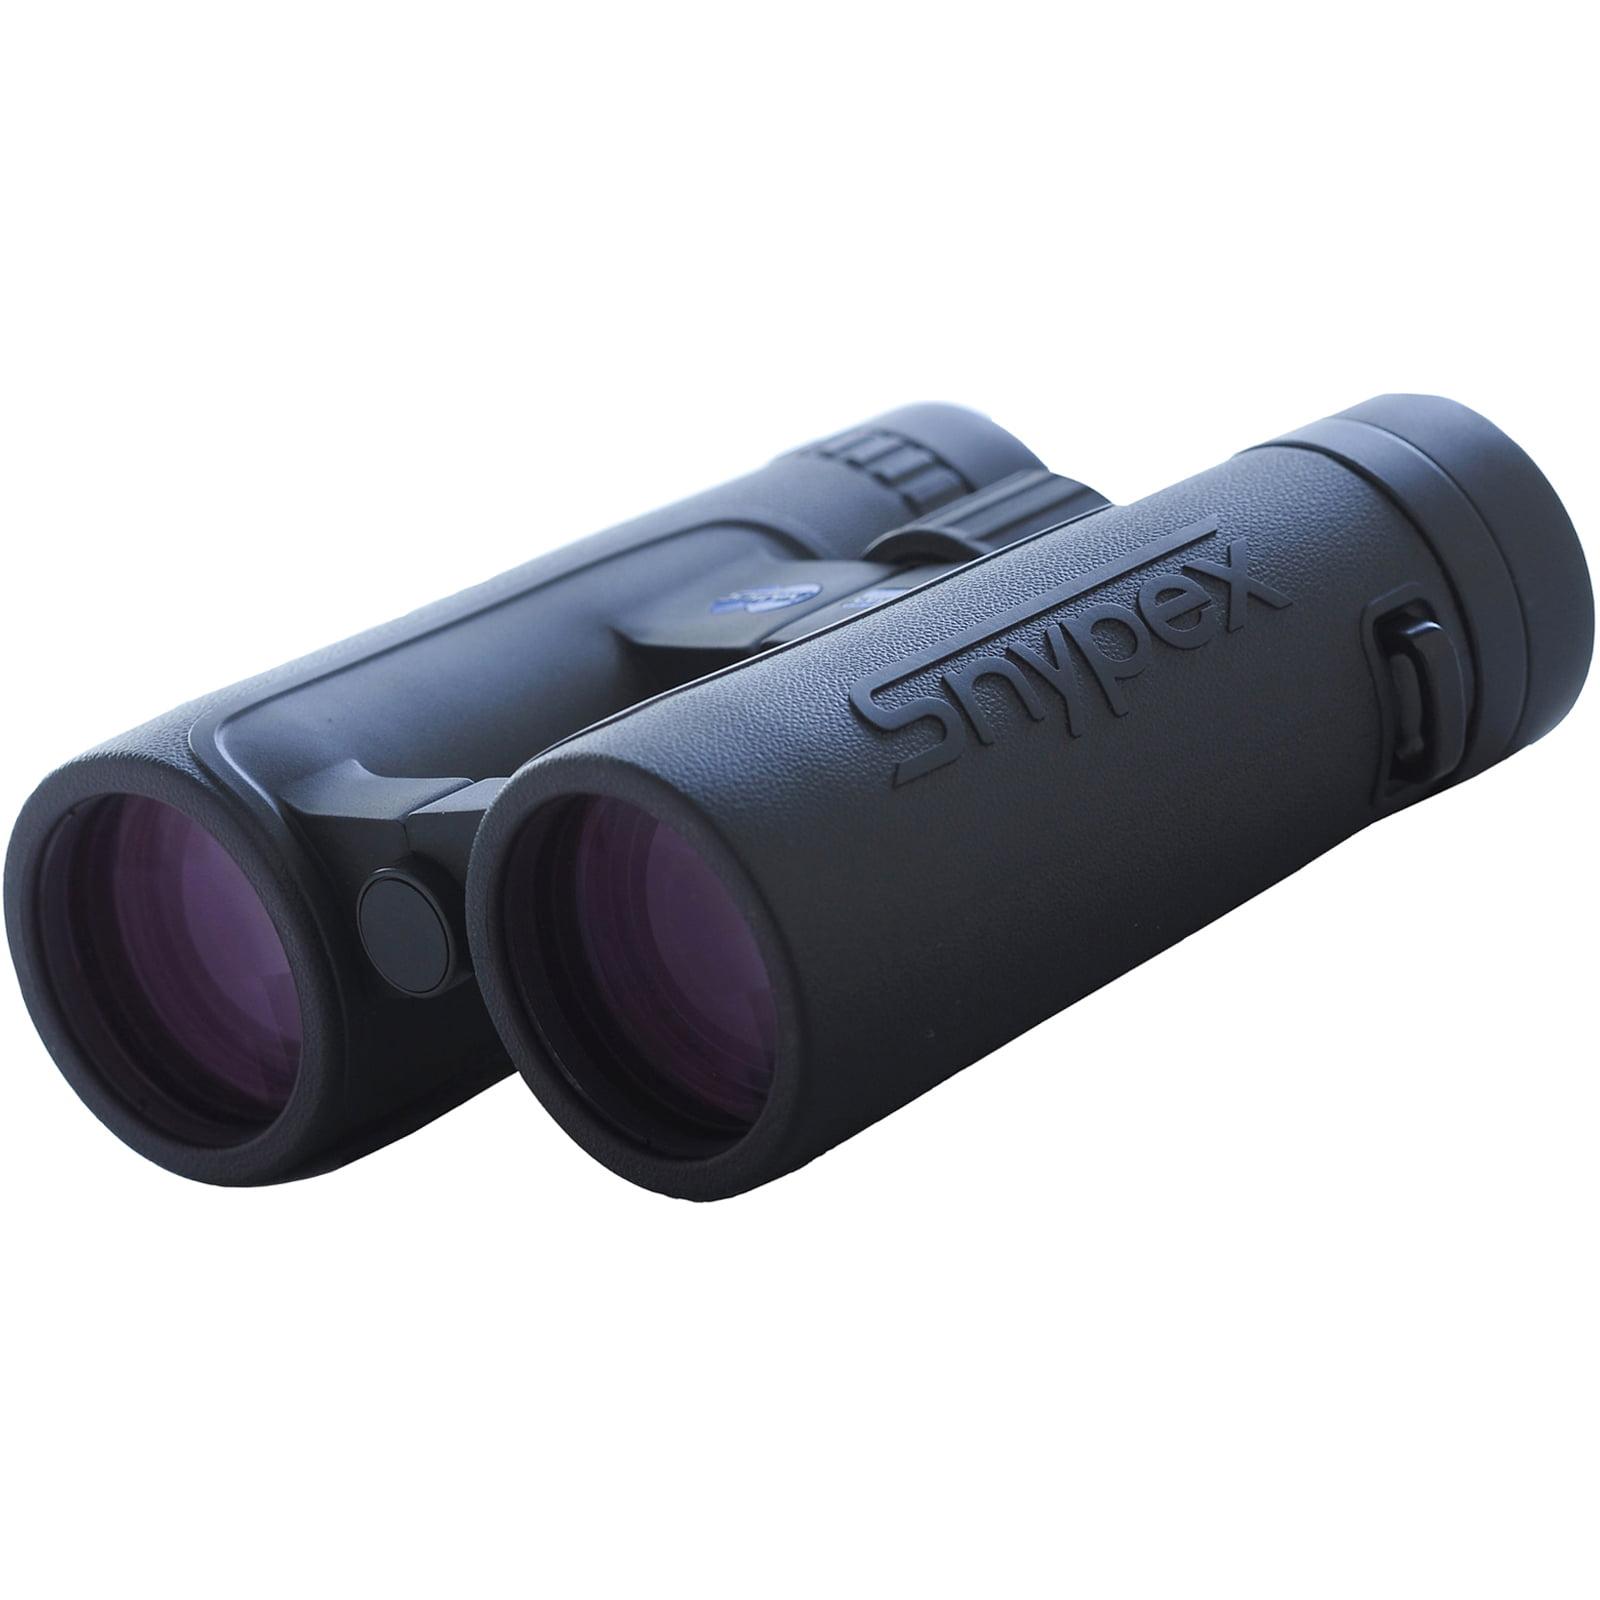 Snypex Knight 10x42 ED Waterproof / Fogproof Binoculars with Case